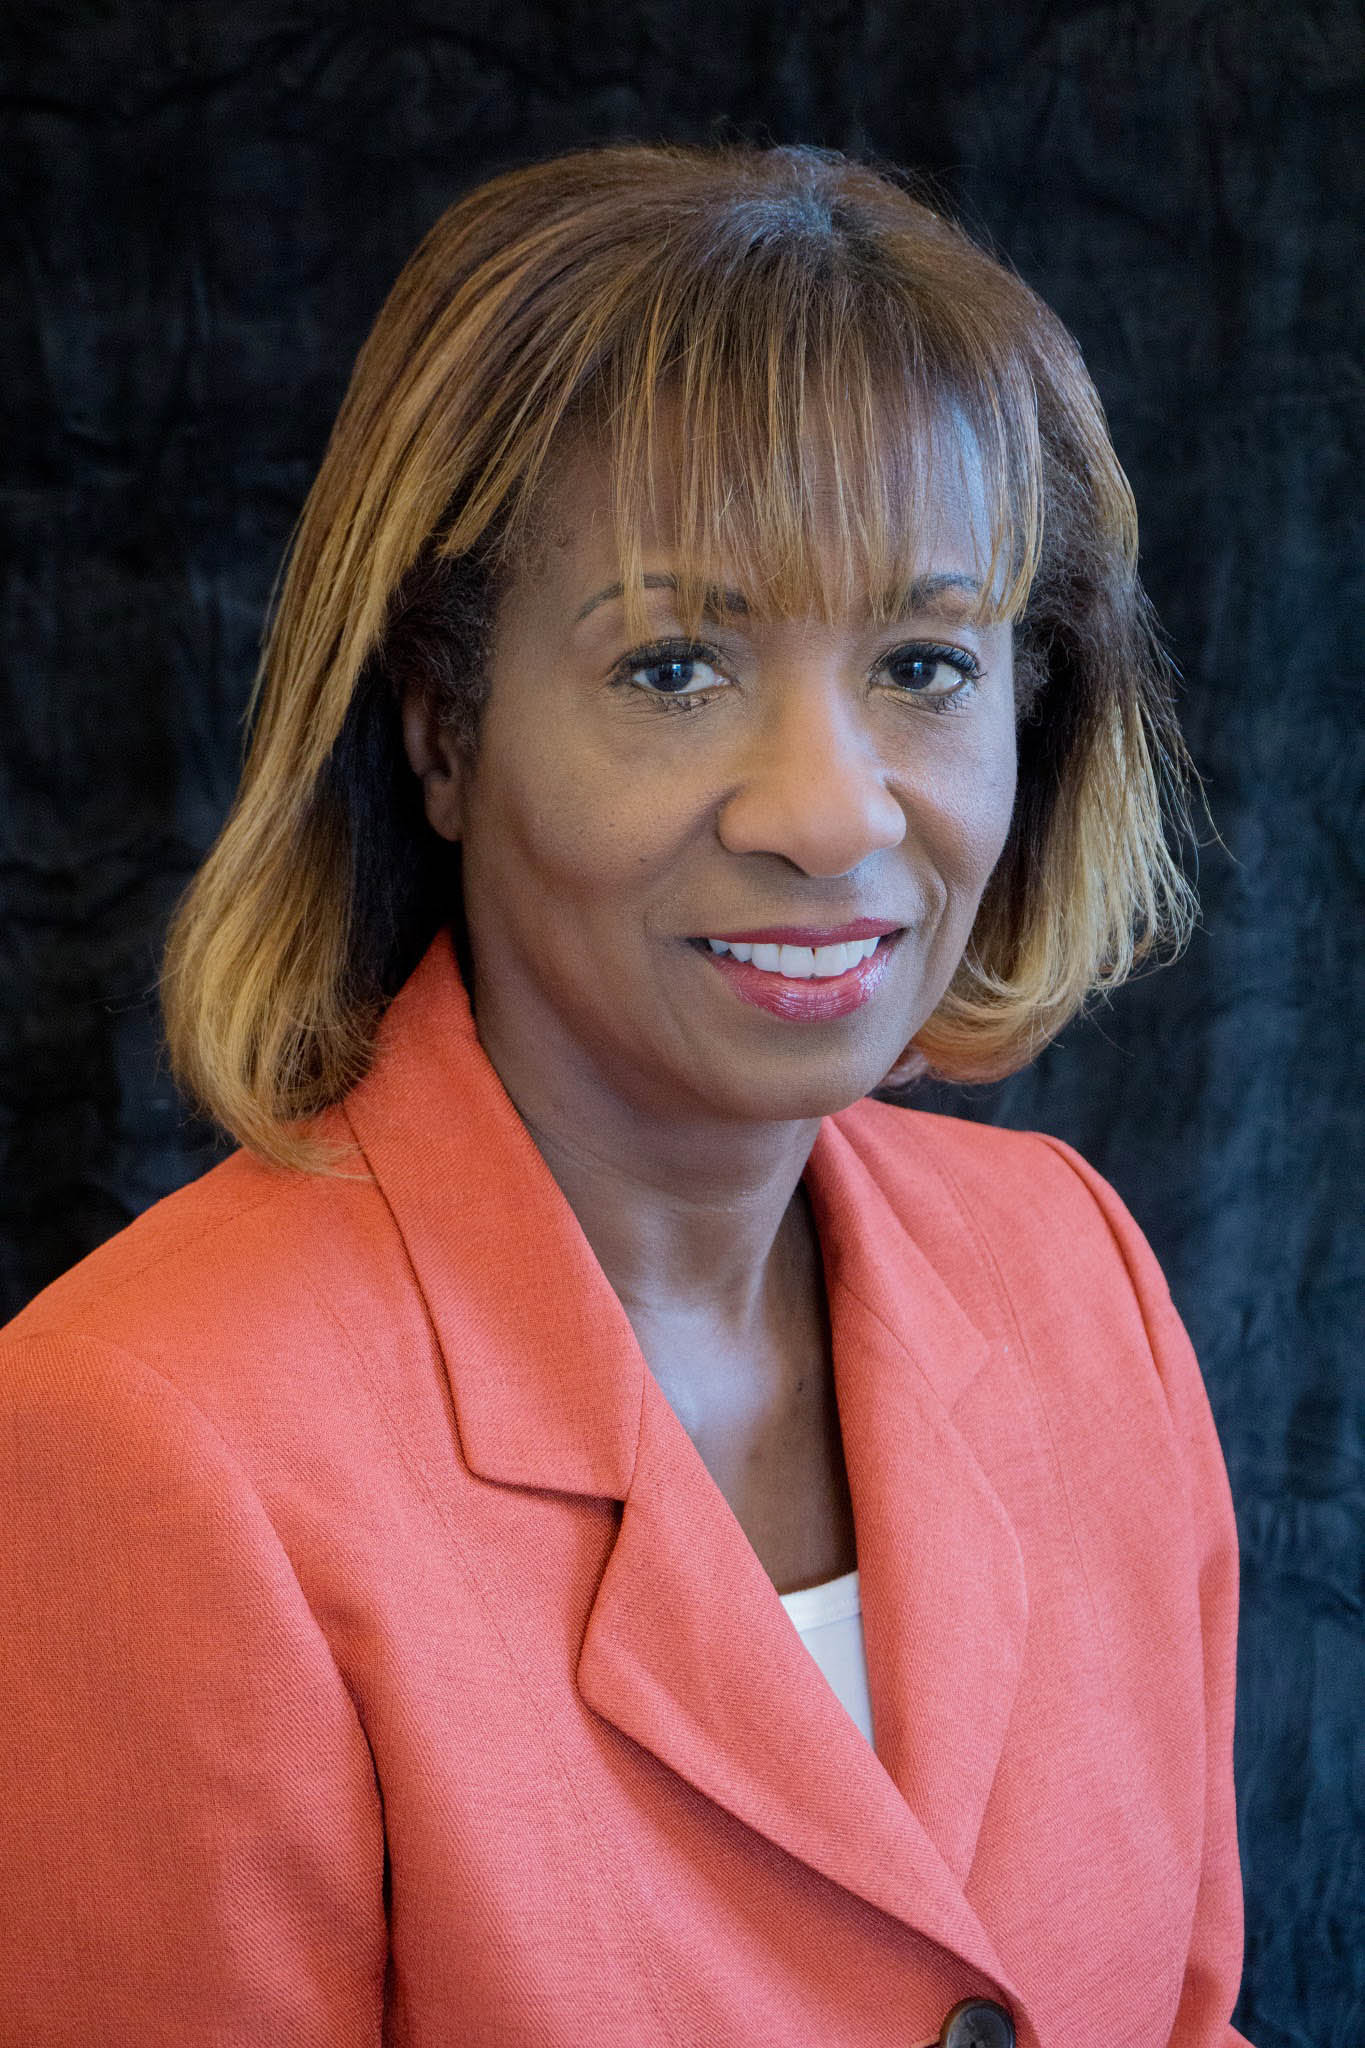 Carla Bryant Headshot 2018 retouched